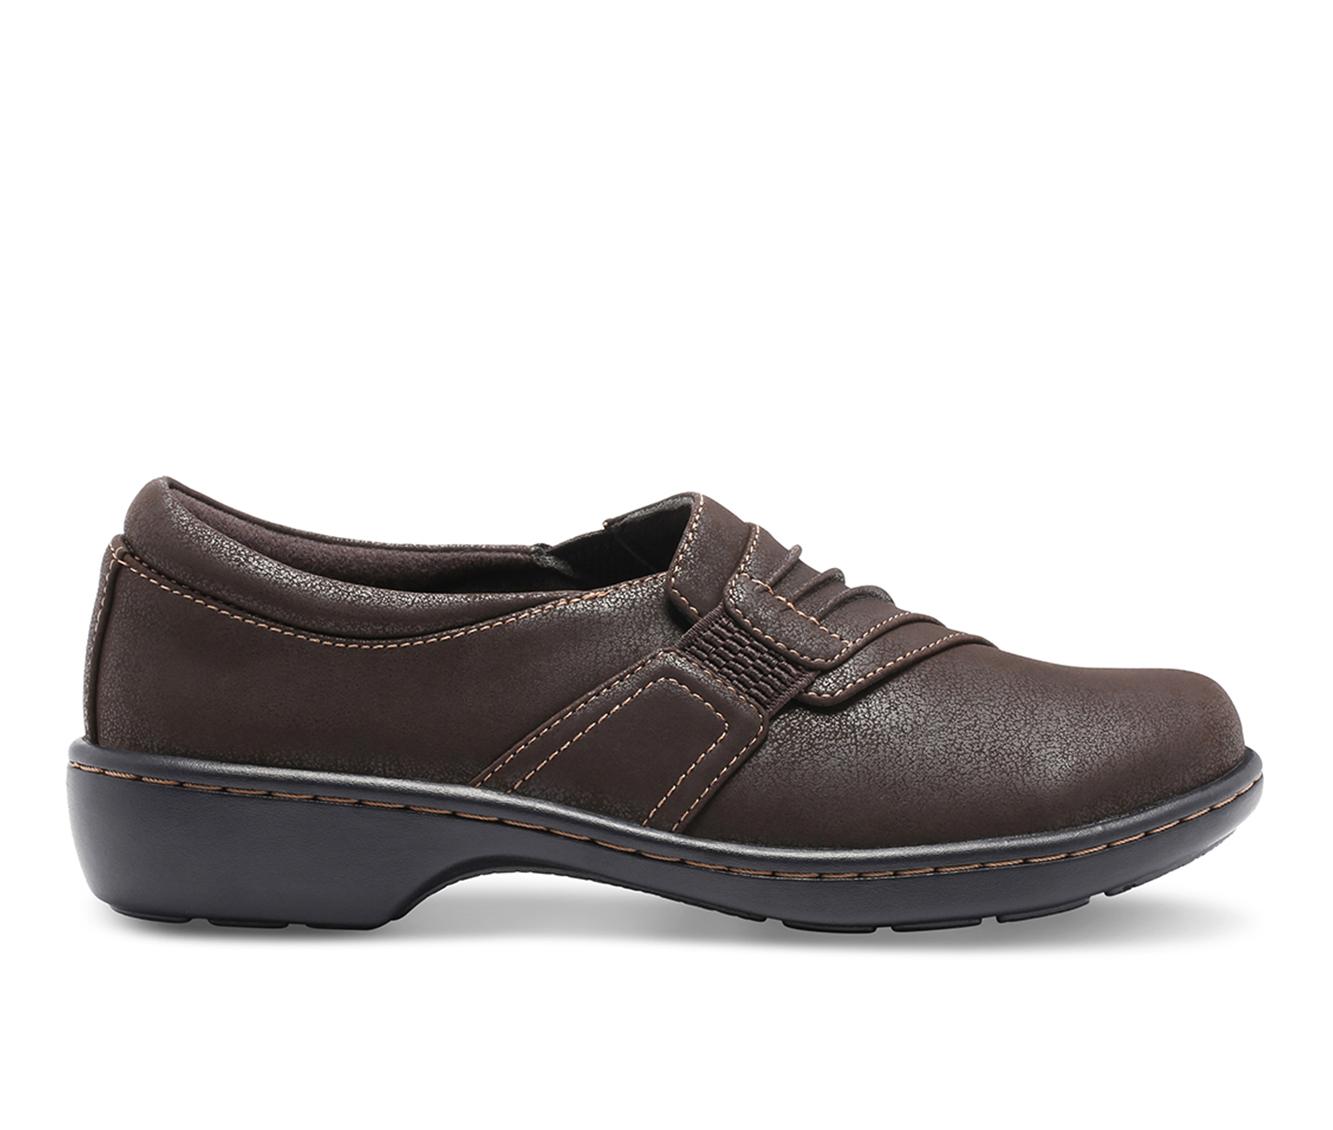 Eastland Piper Women's Shoe (Brown Leather)